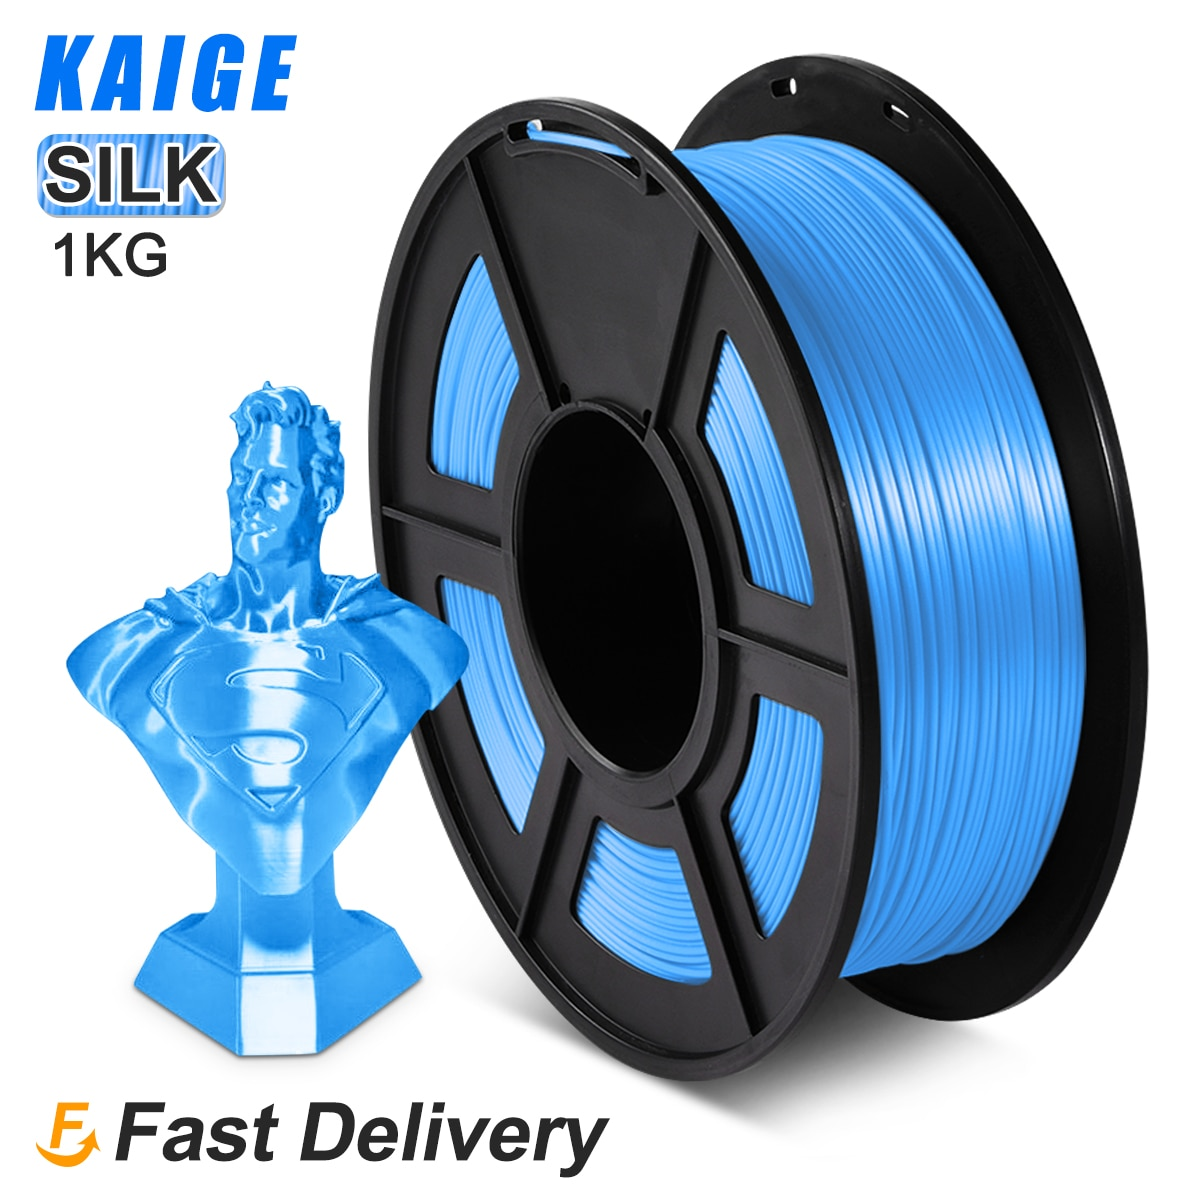 KAIGE-ملف طباعة ثلاثي الأبعاد من الحرير PLA ، 1.75 مللي متر ، 1 كجم ، متعدد الألوان ، للطباعة